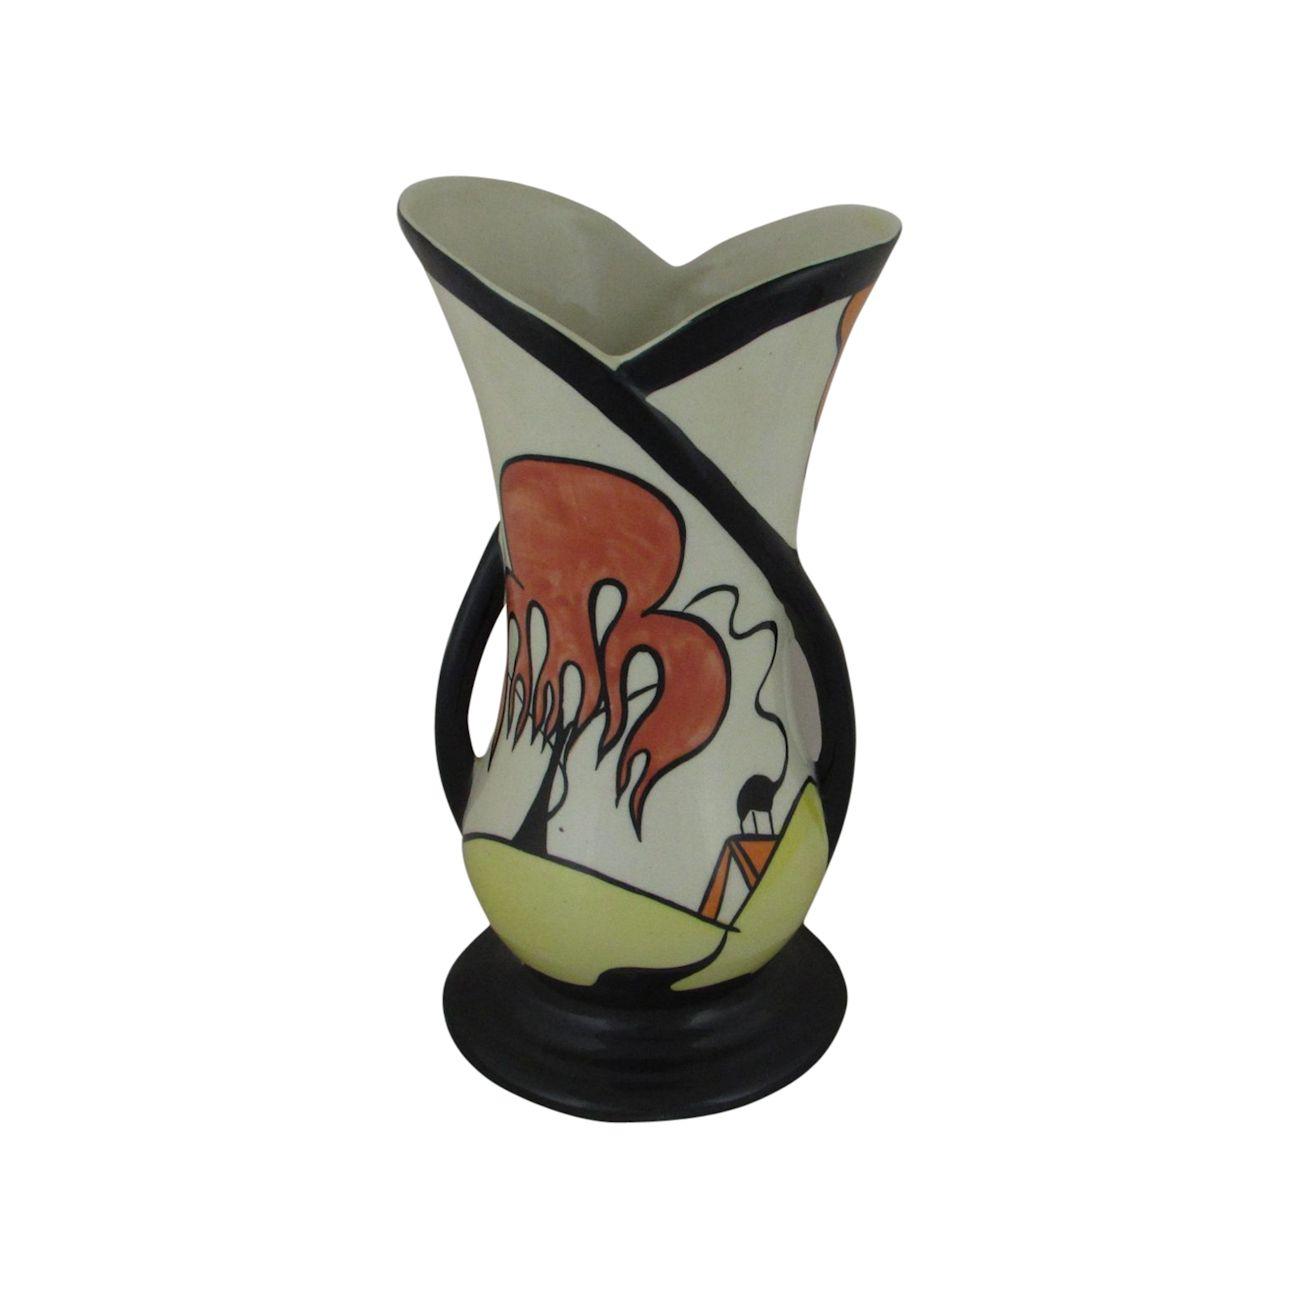 Lorna Bailey Dingle Porthill Design Two Handled Vase